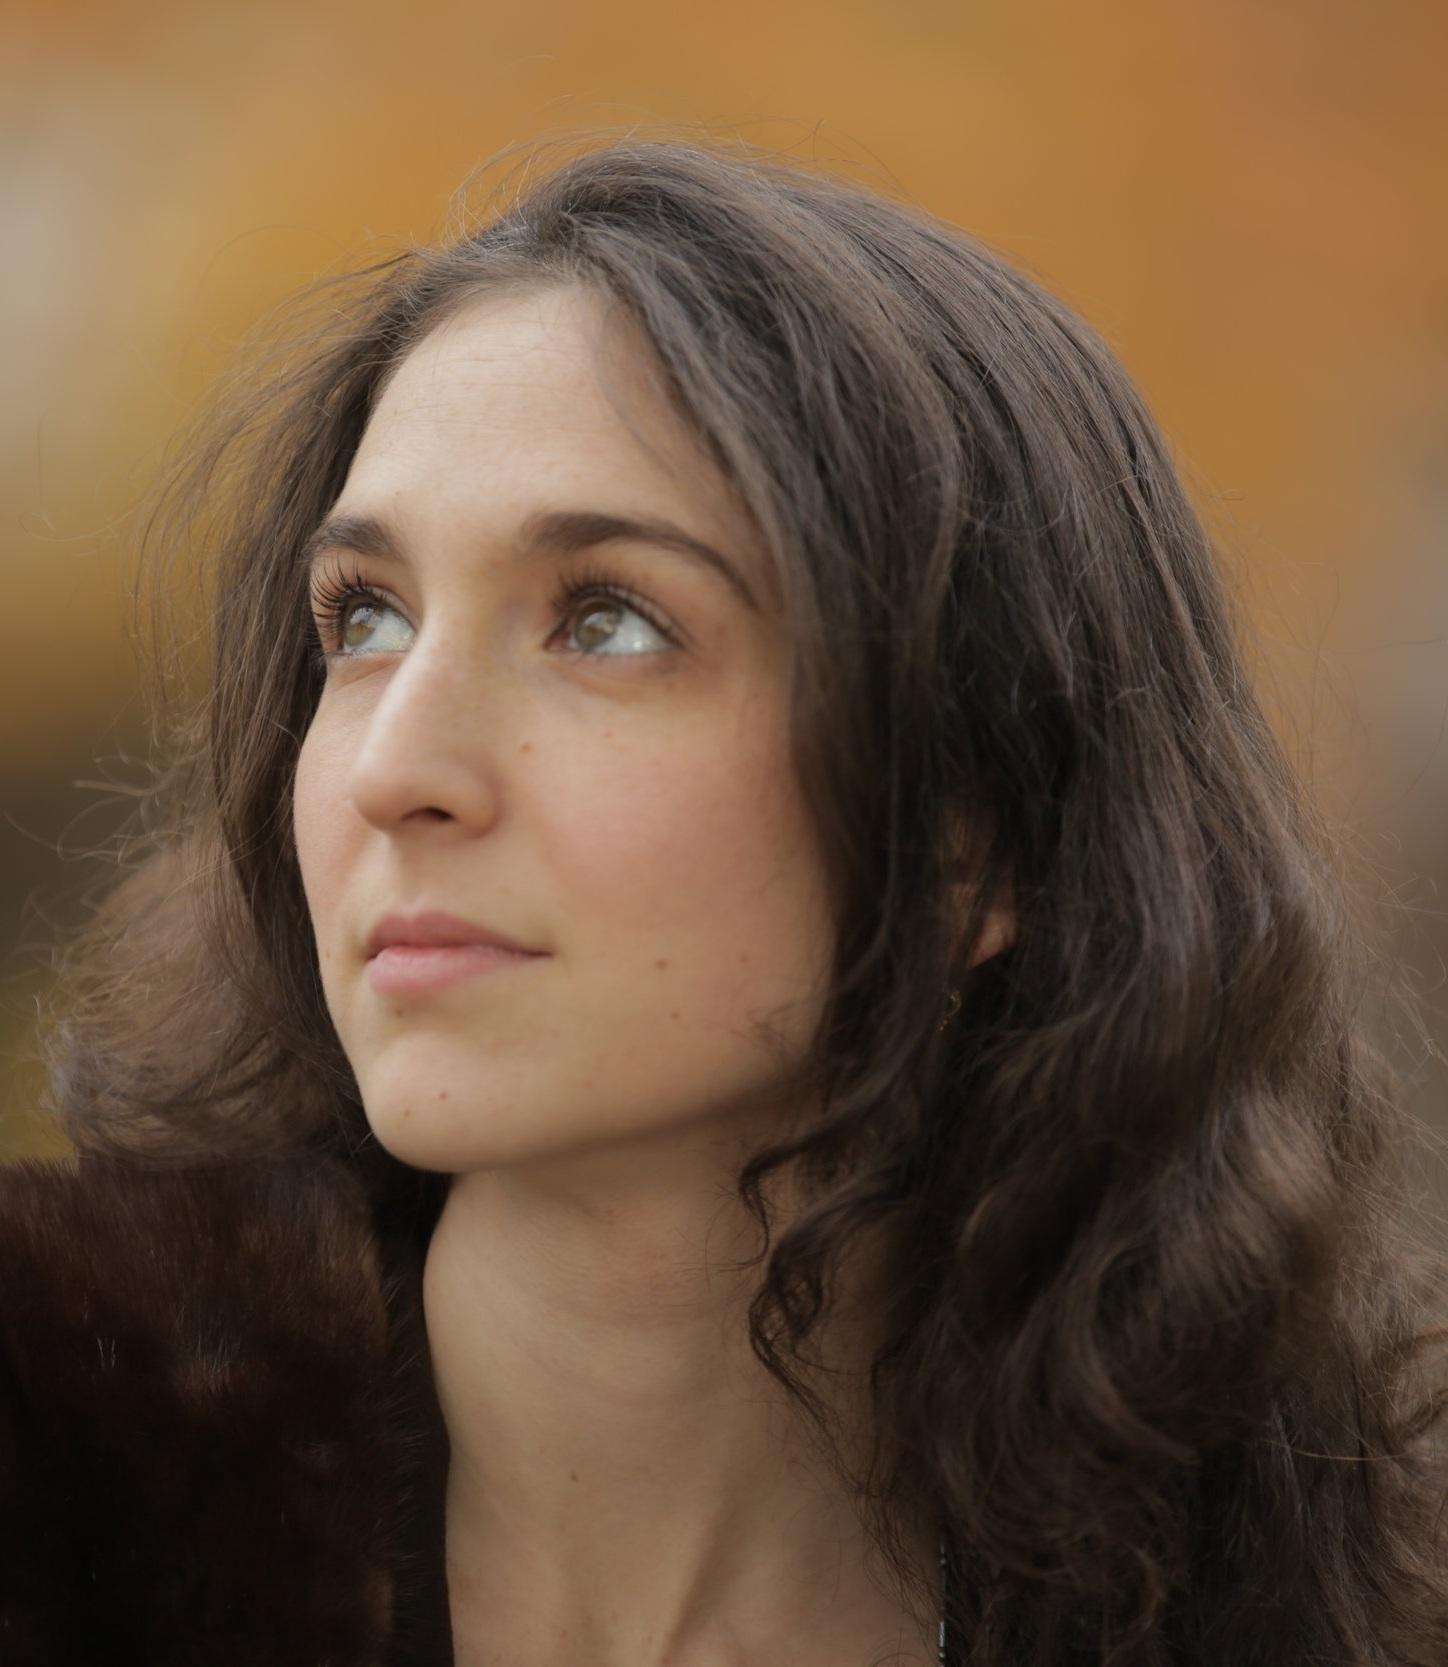 DEBUSSY Three Études: Chromatic, Octaves, and Opposing Sonorities - Julia Hamos, piano